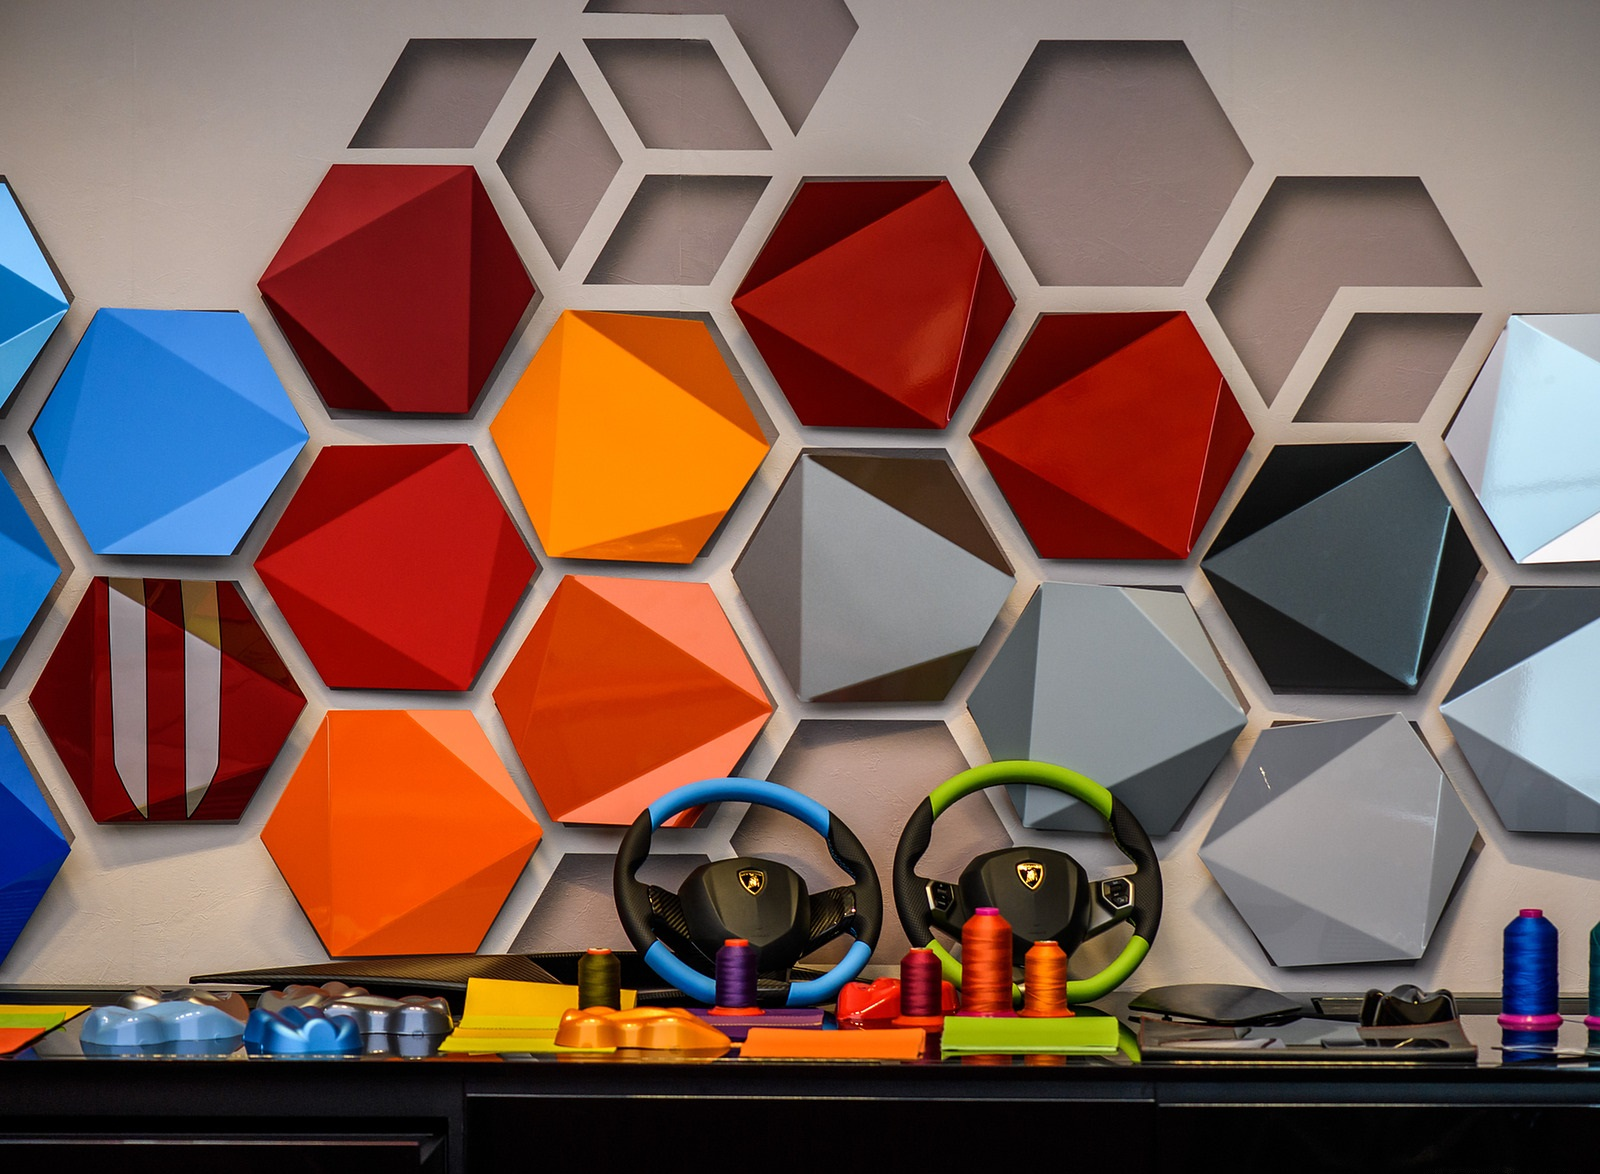 2020 Lamborghini Aventador SVJ Xago Edition Making Of Wallpapers #11 of 12